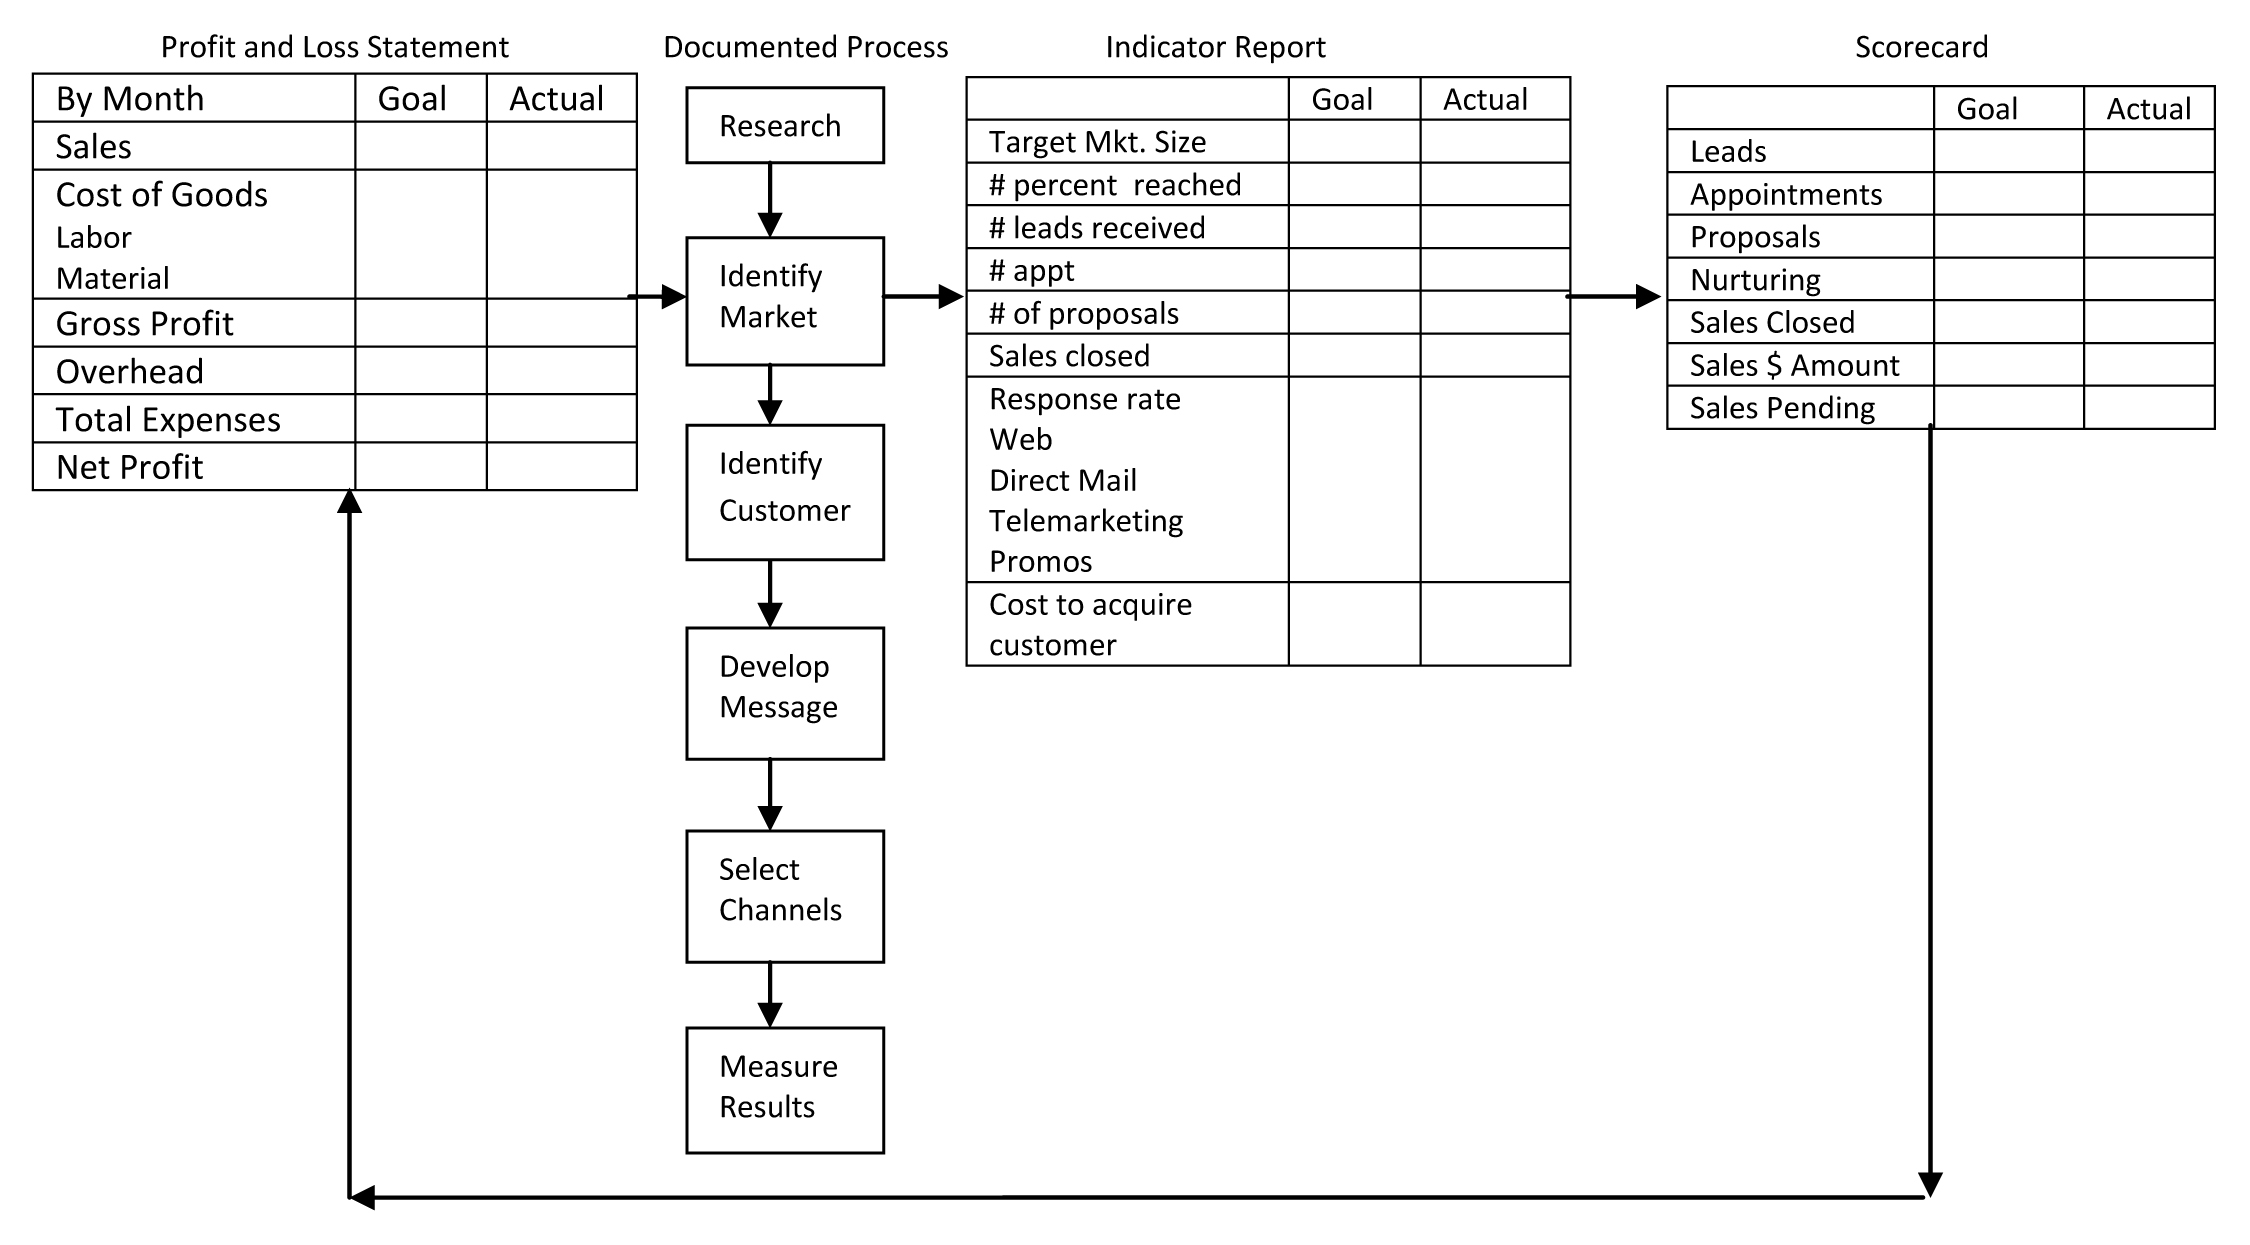 Intralink chart